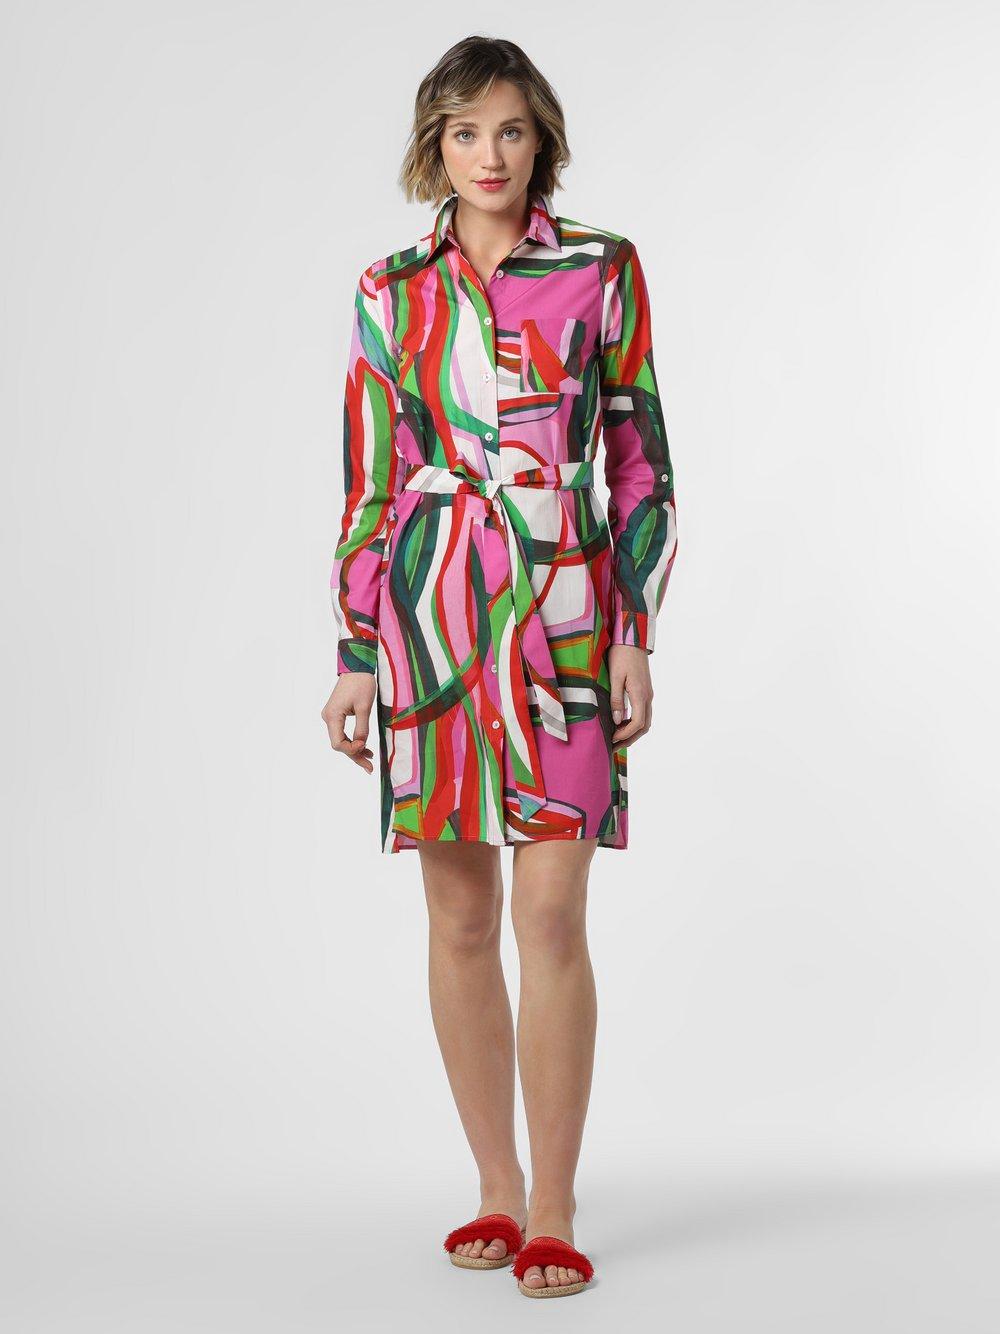 0039 Italy – Sukienka damska – Gracia, różowy Van Graaf 464305-0001